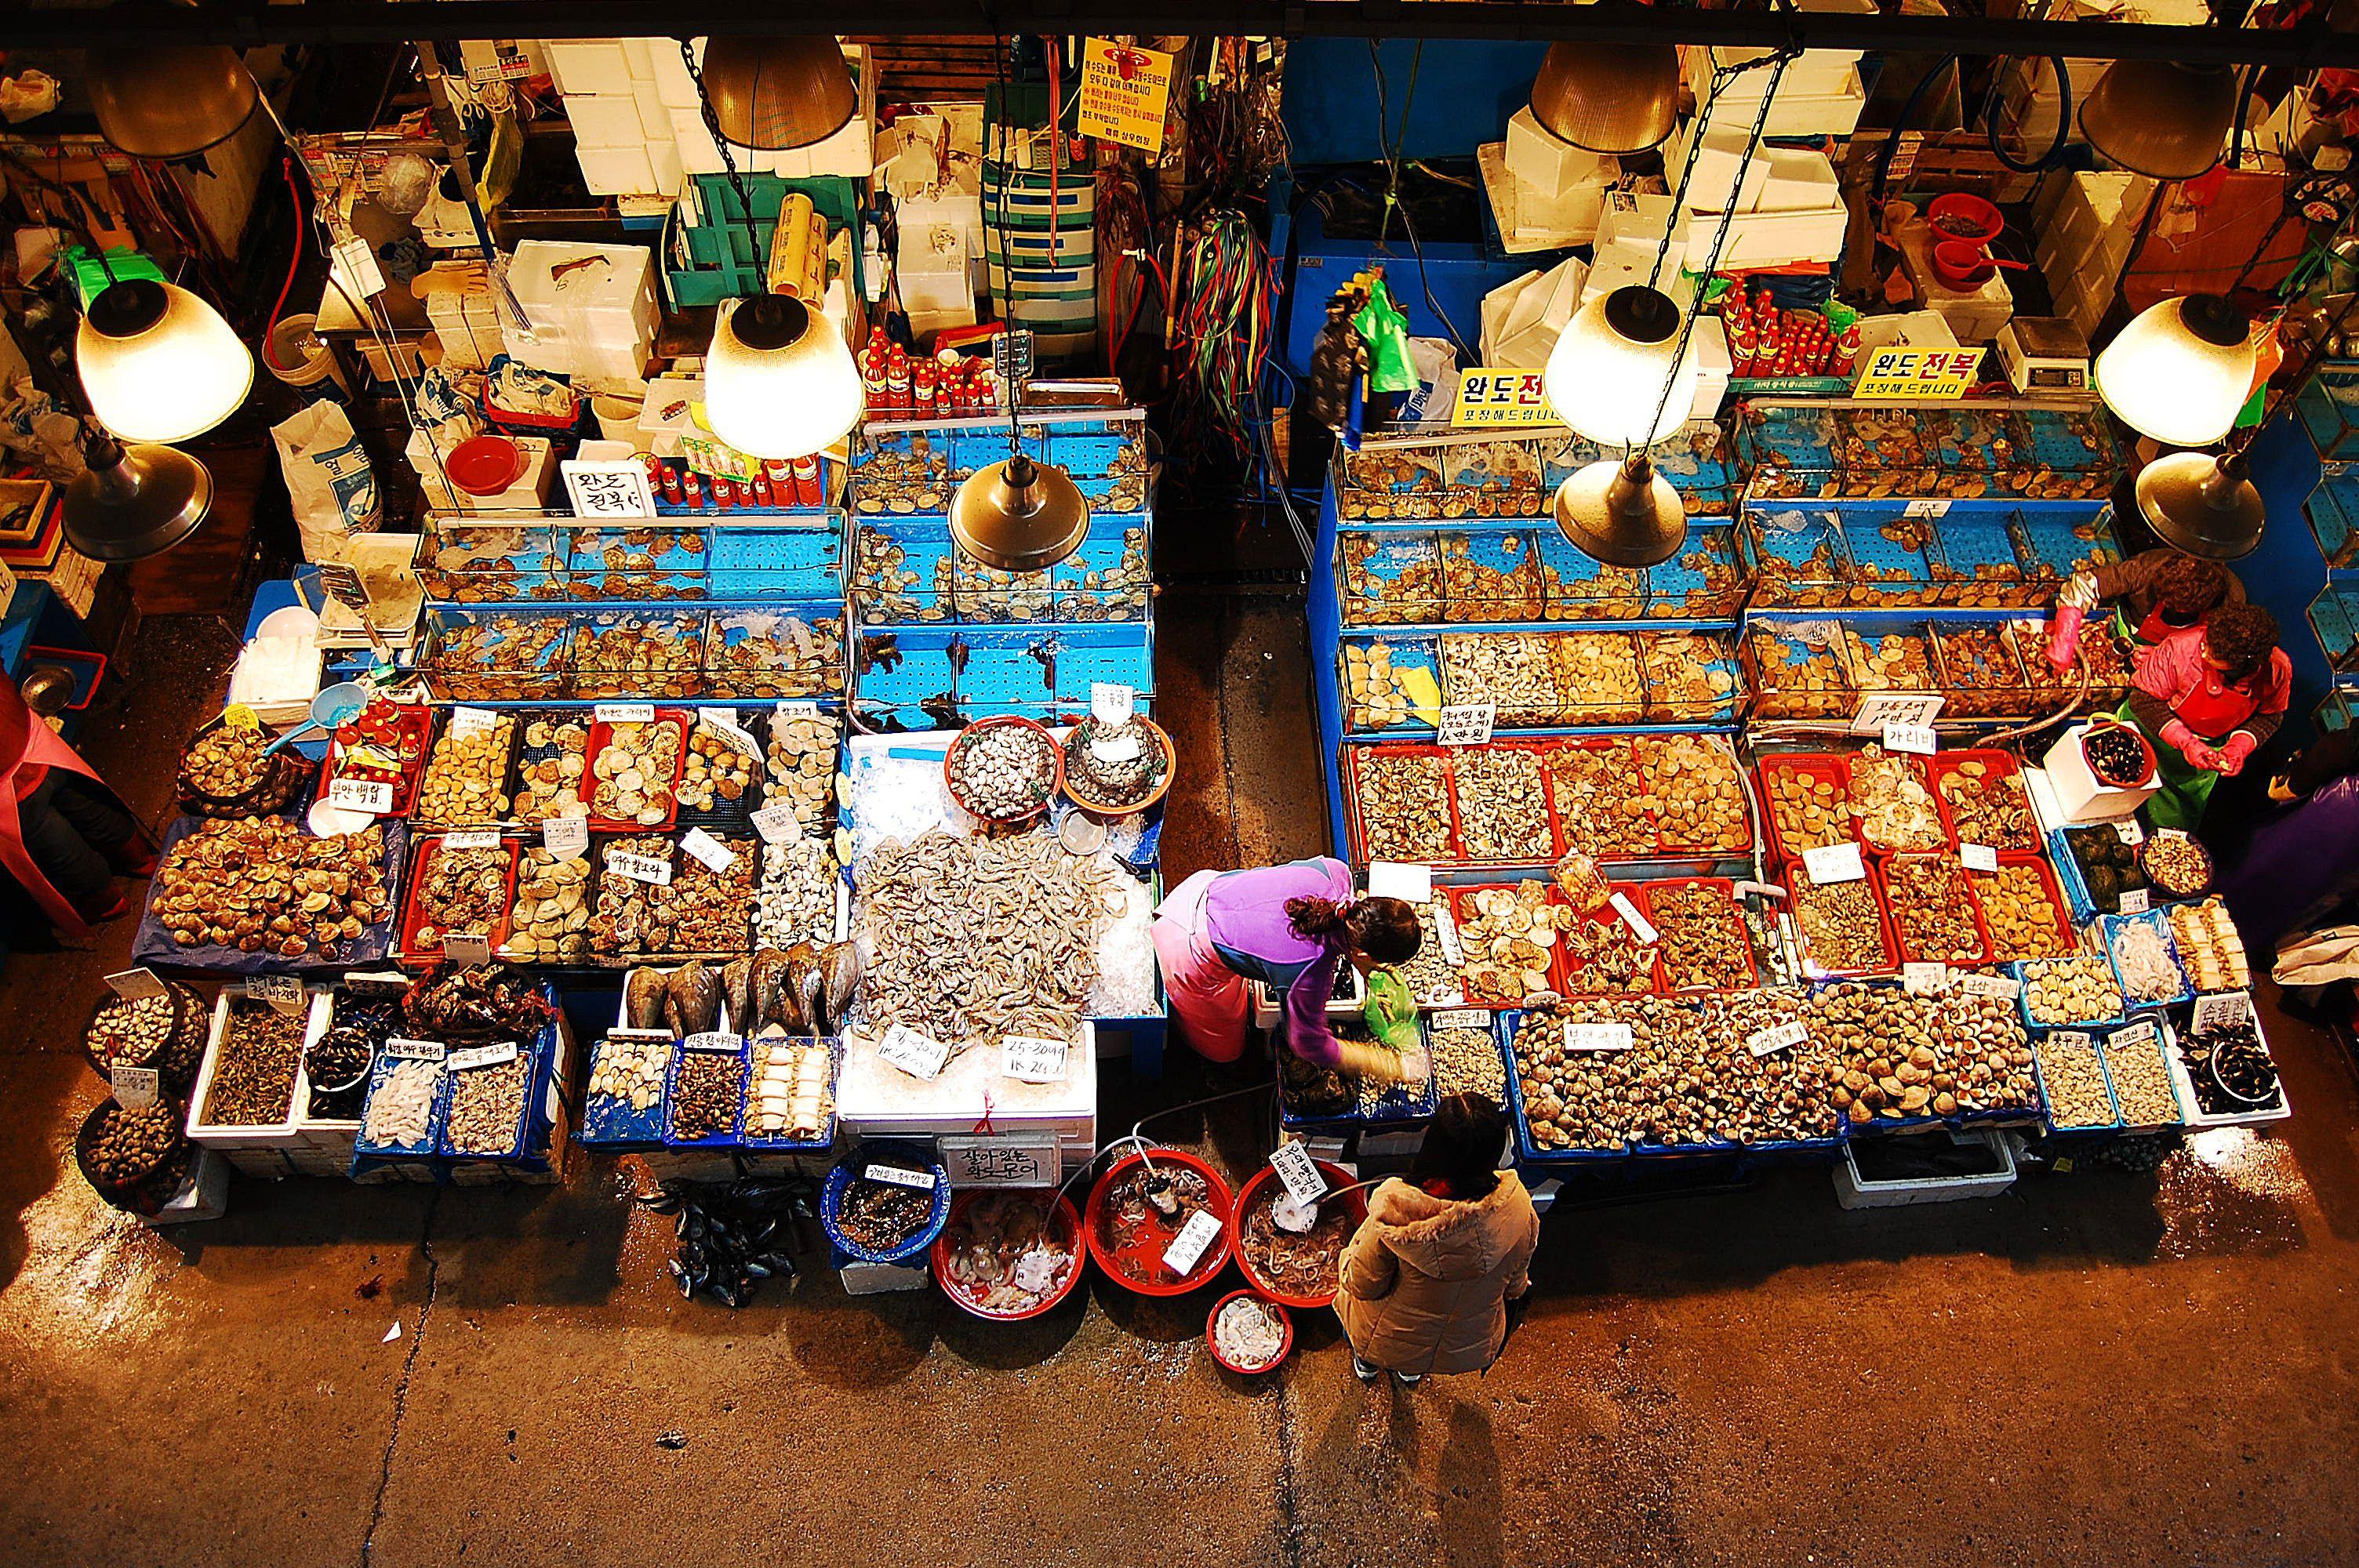 Overhead view of a market in Seoul, Korea